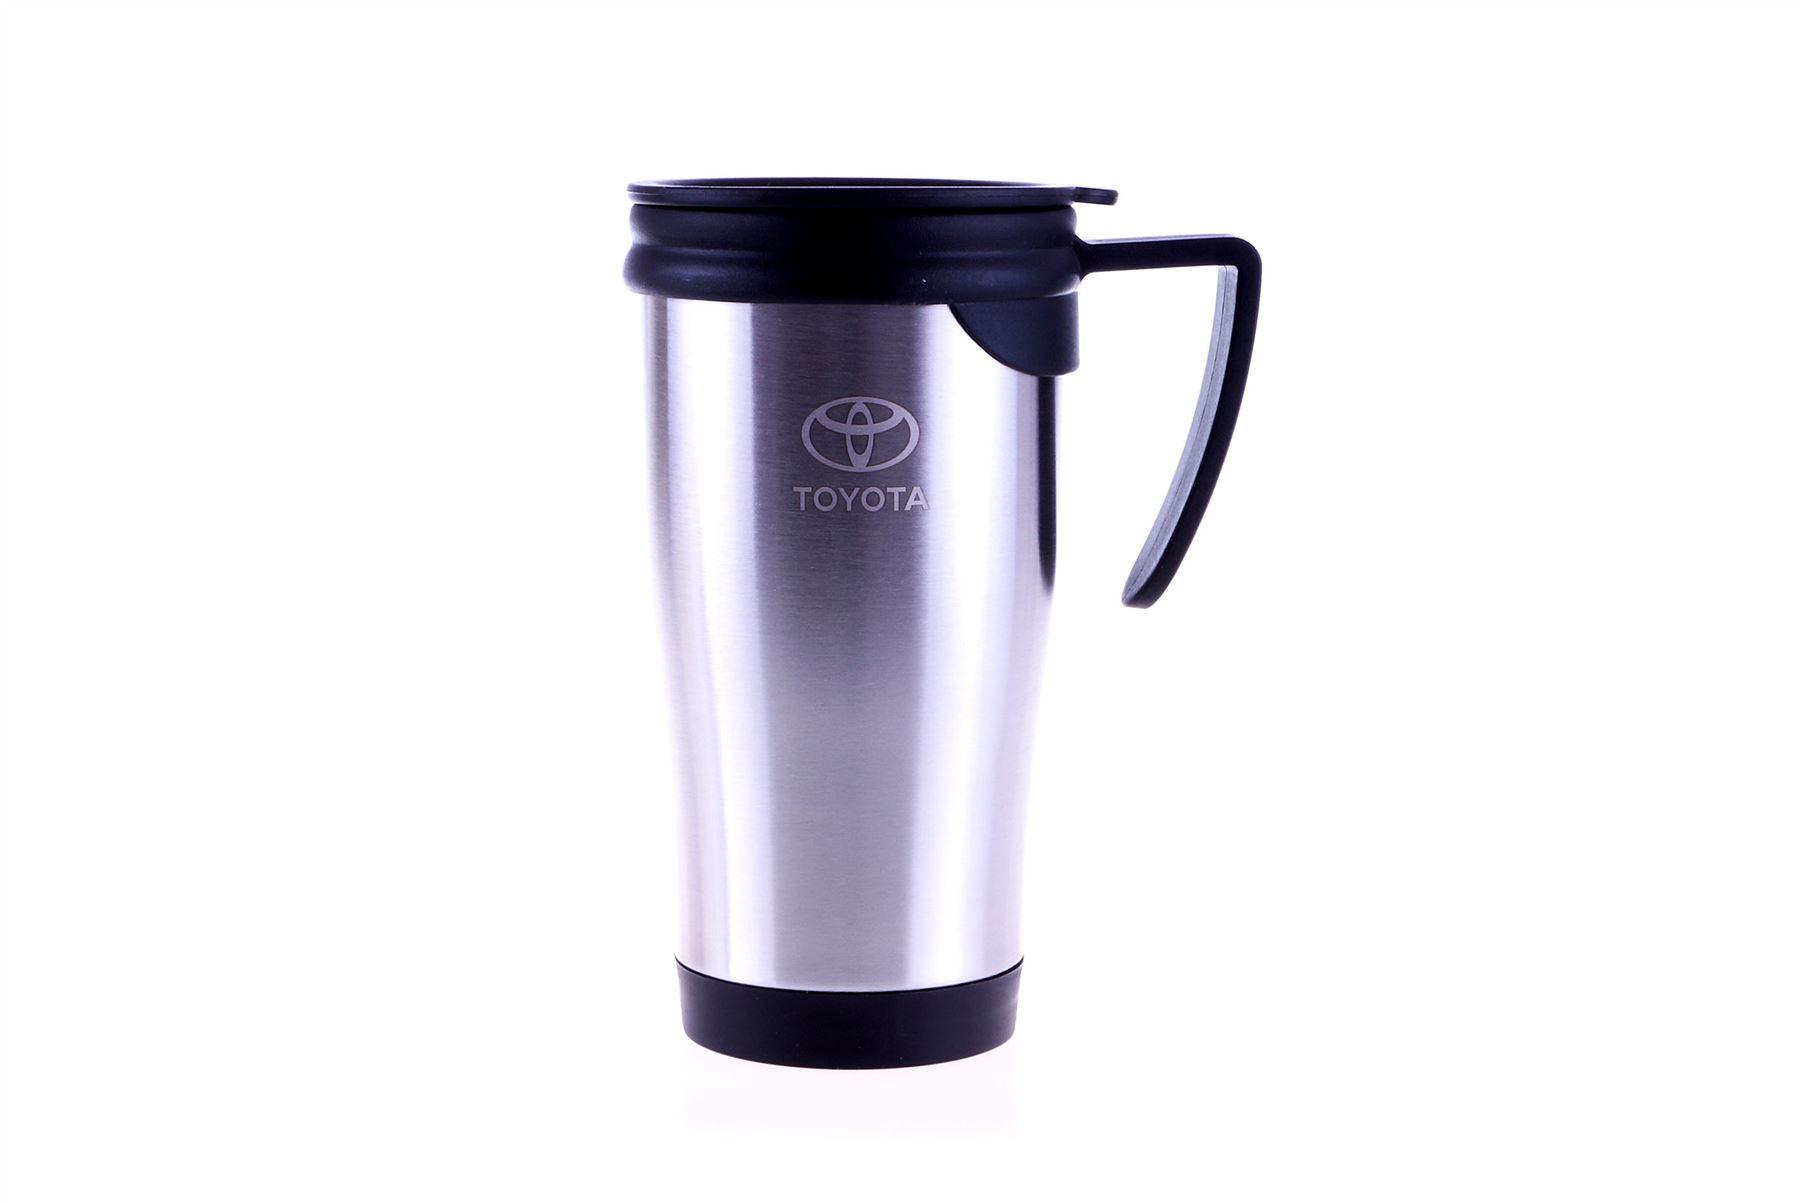 Genuine Toyota 450ml Stainless Steel Travel Coffee Cup Mug